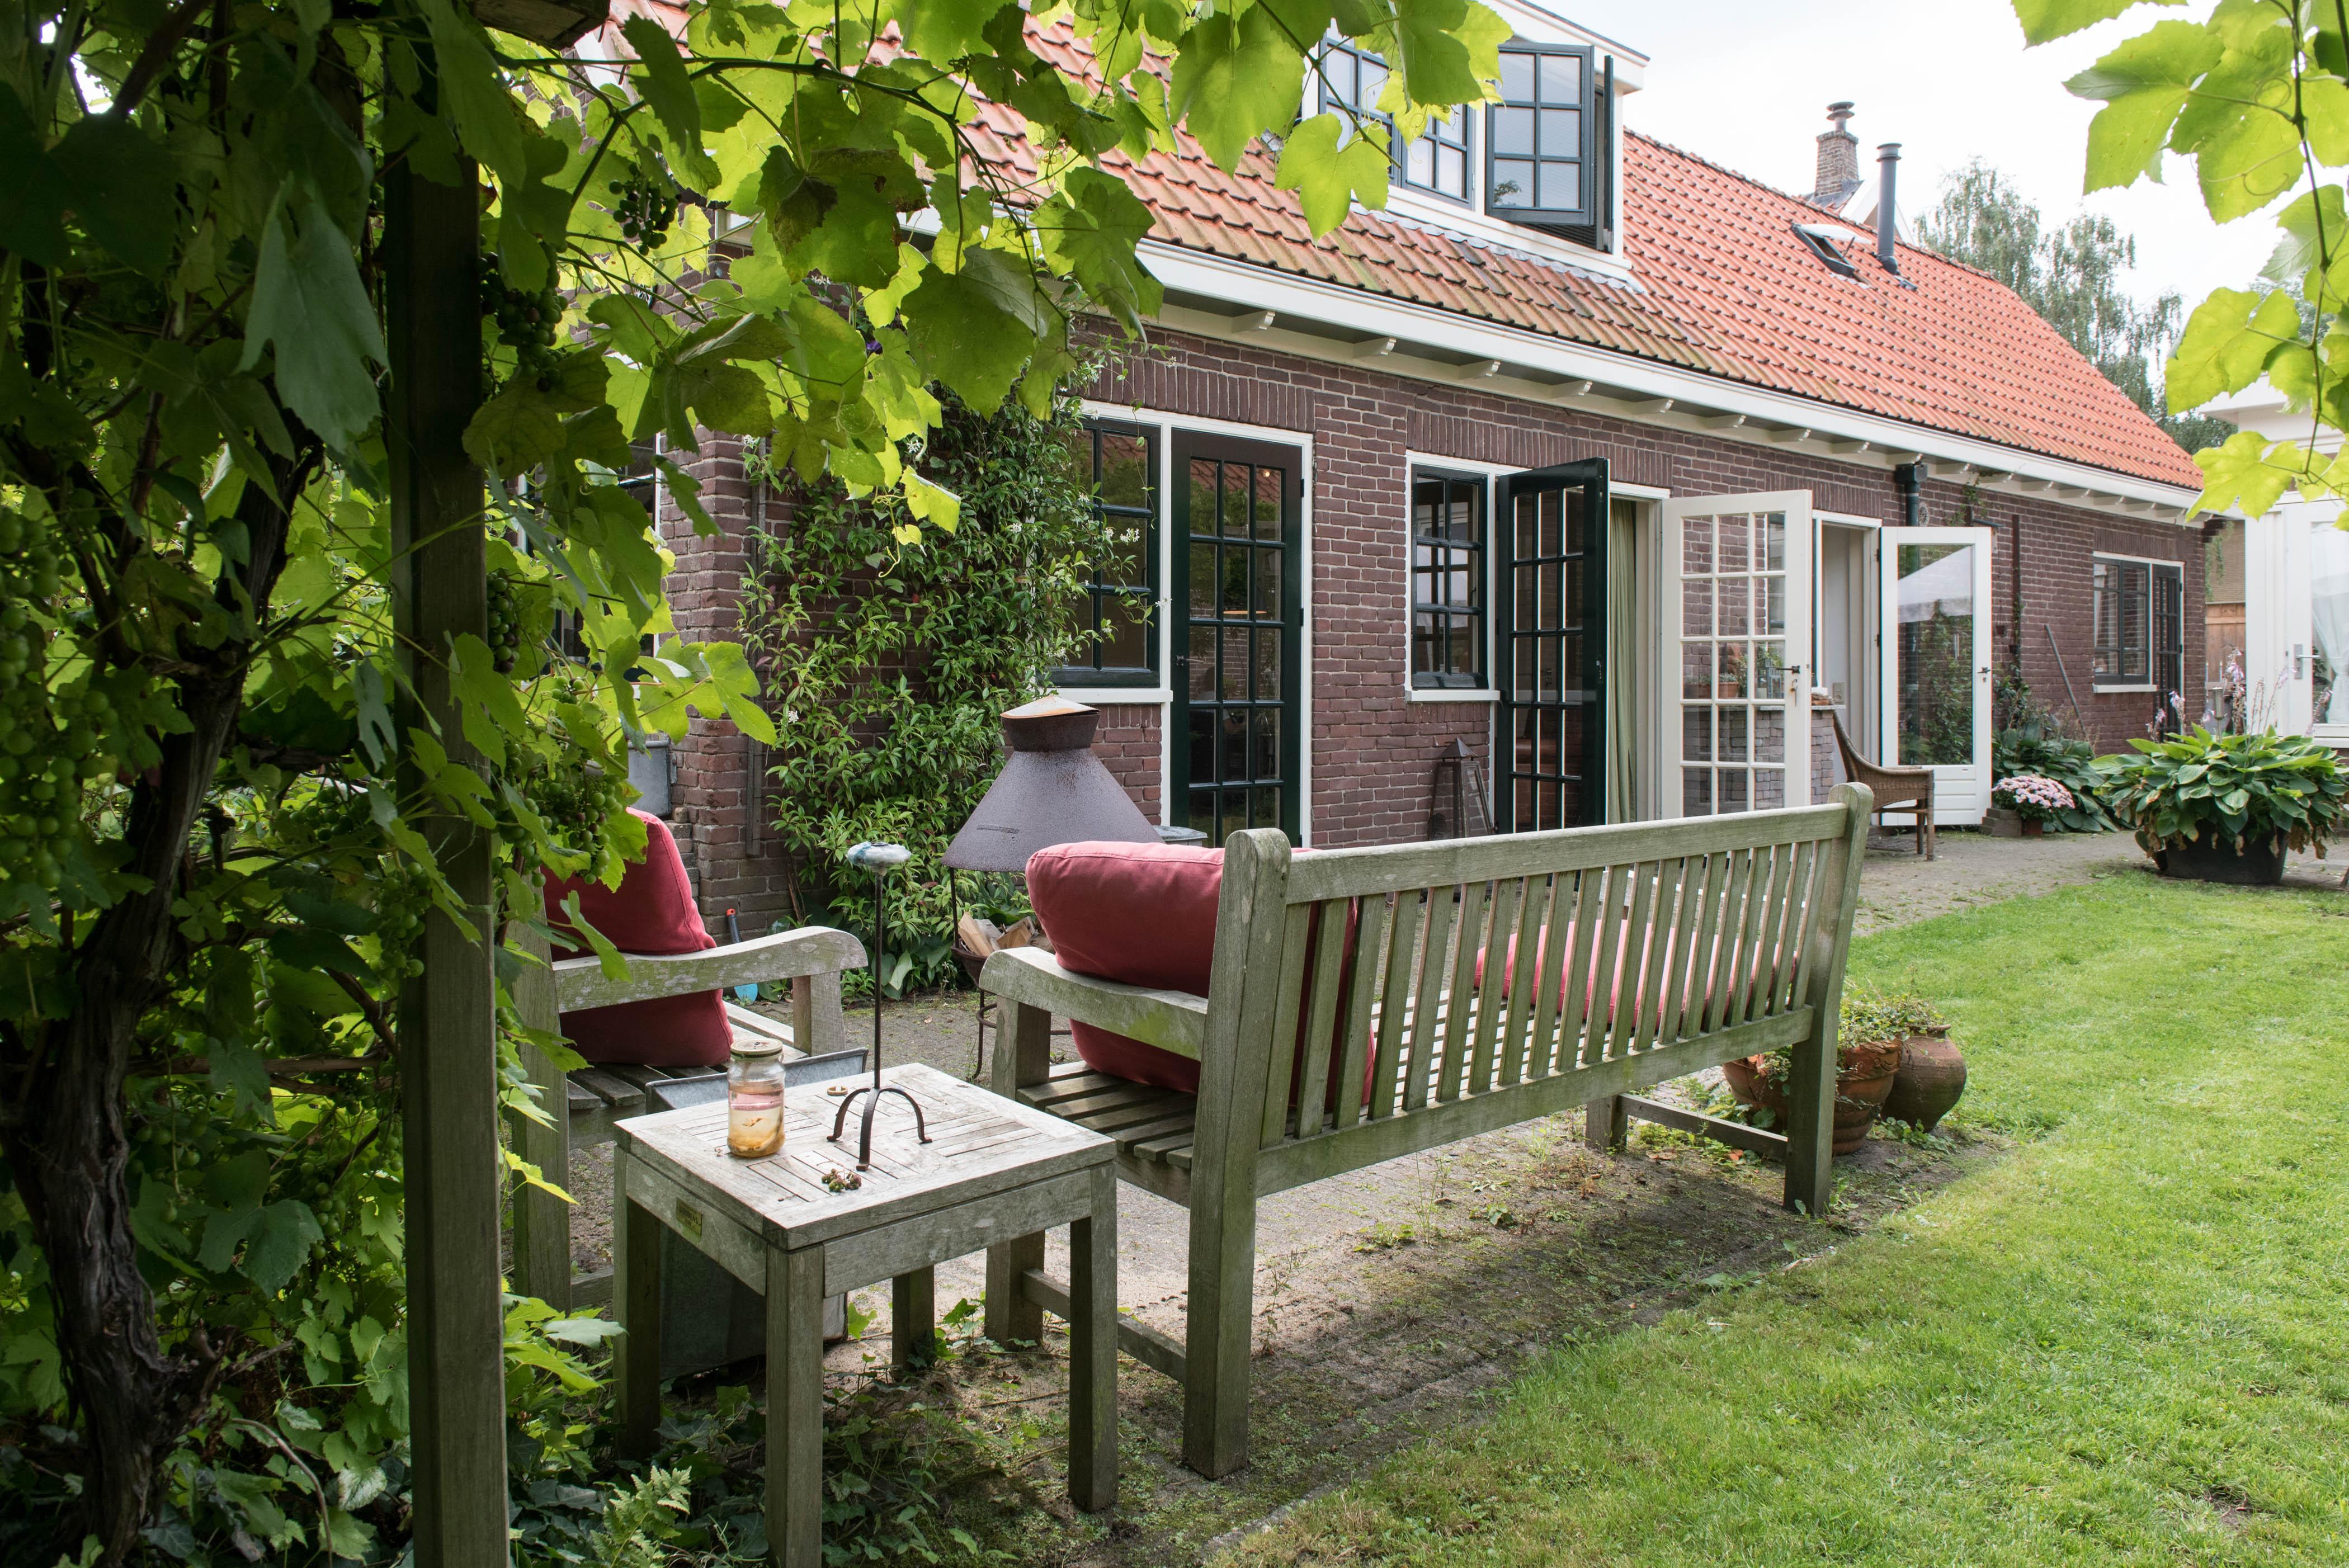 The Lazy lodge Amsterdam photo 5902390